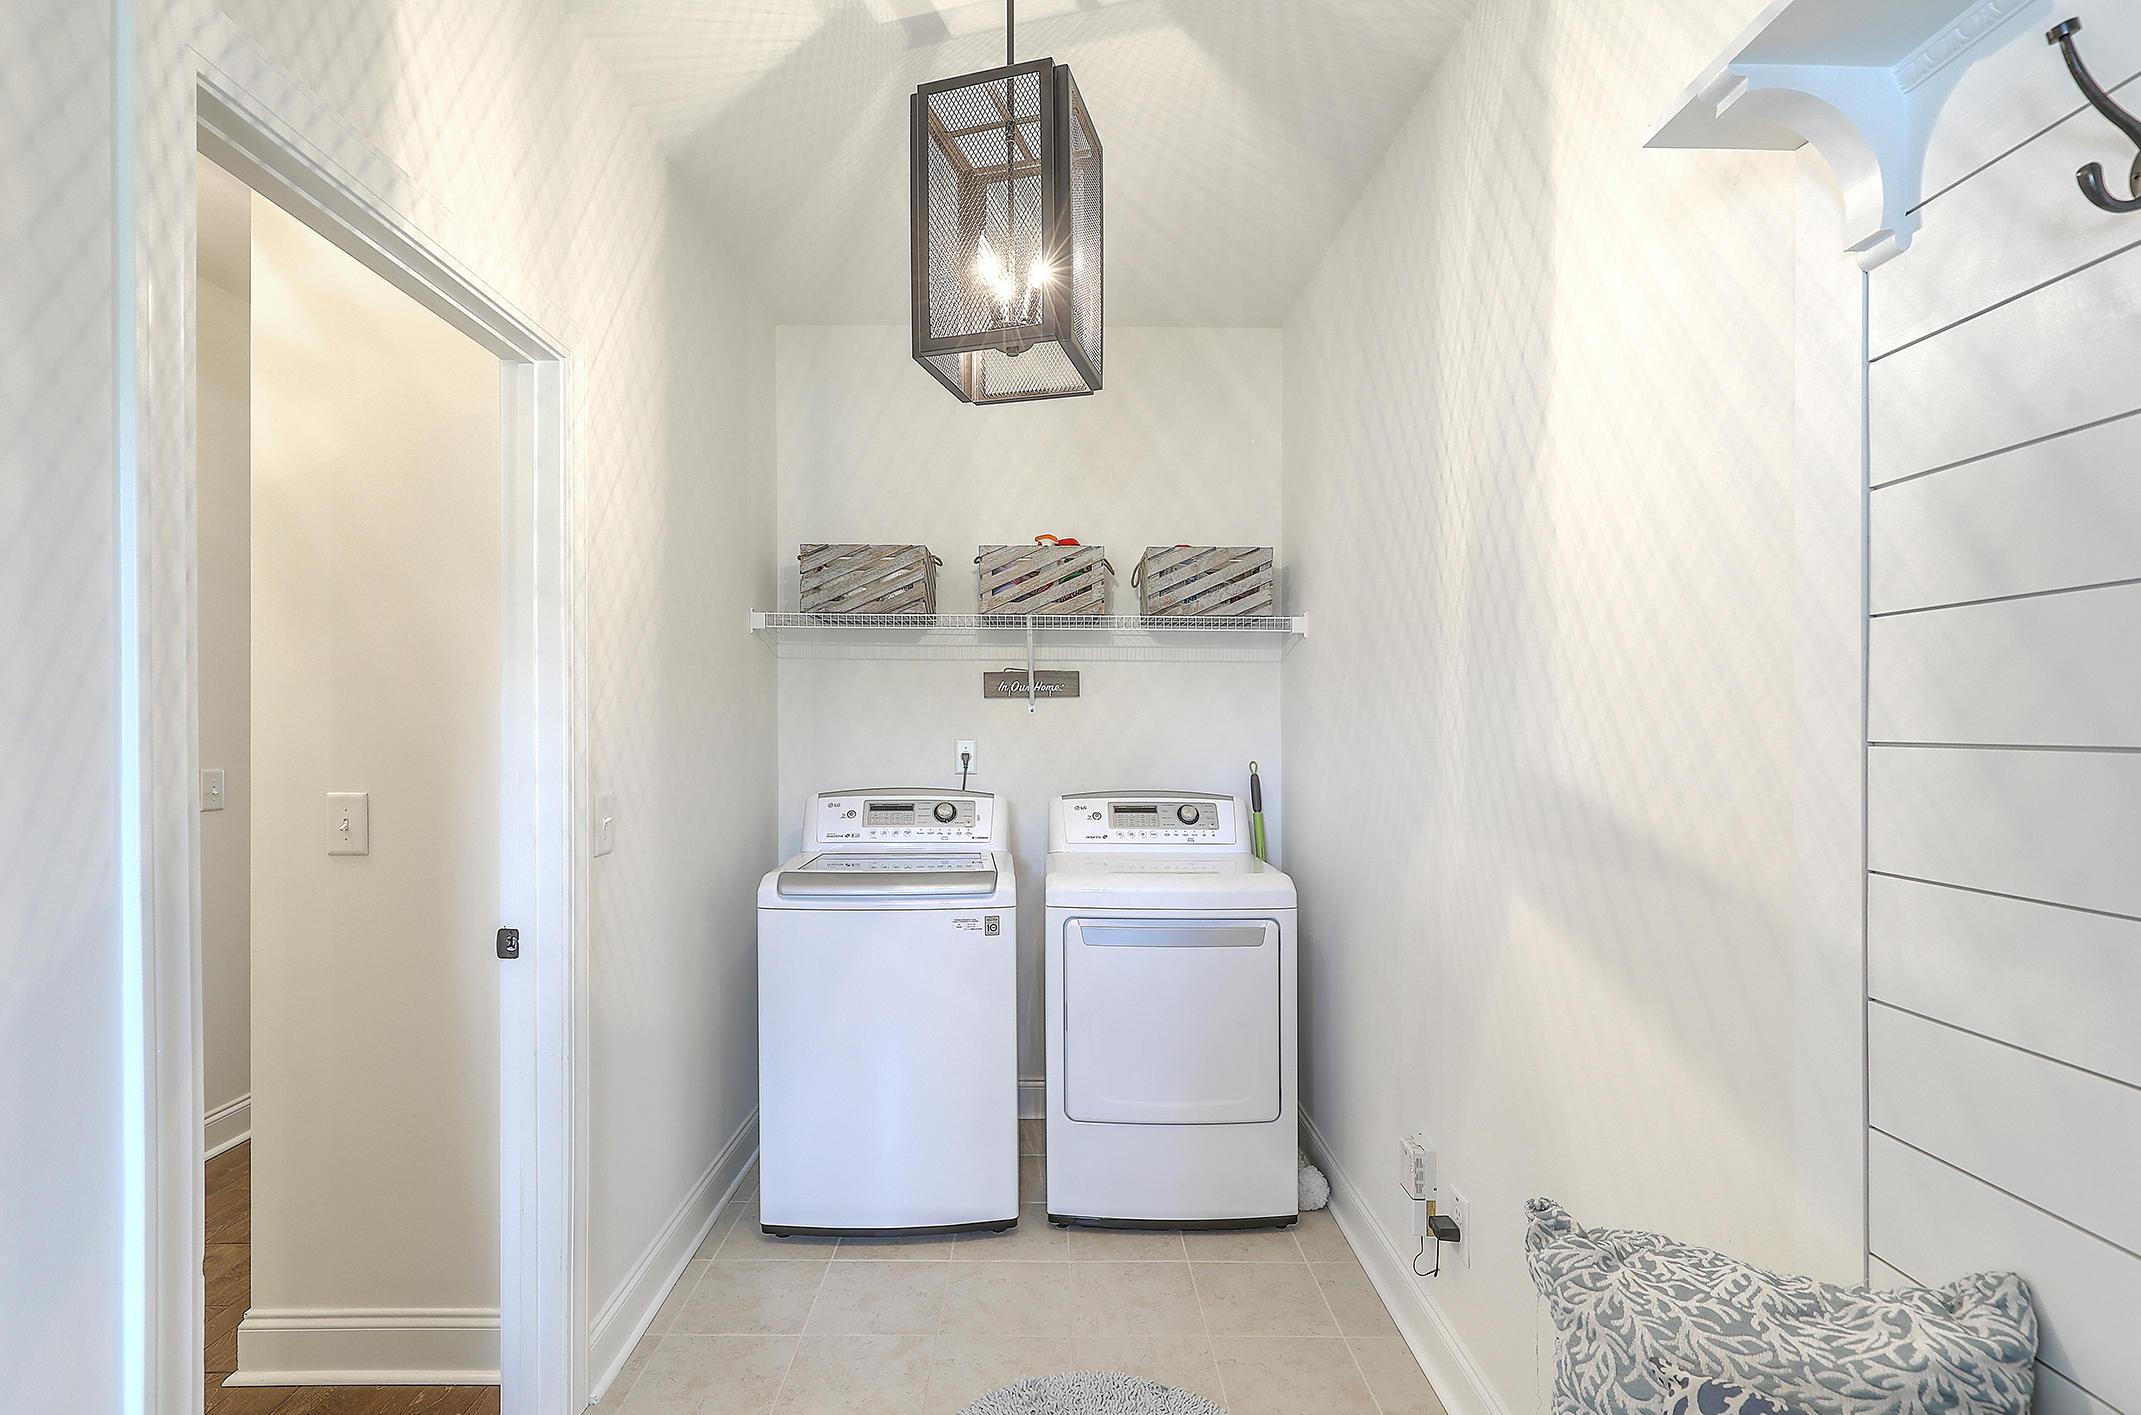 Park West Homes For Sale - 3412 Salterbeck, Mount Pleasant, SC - 22